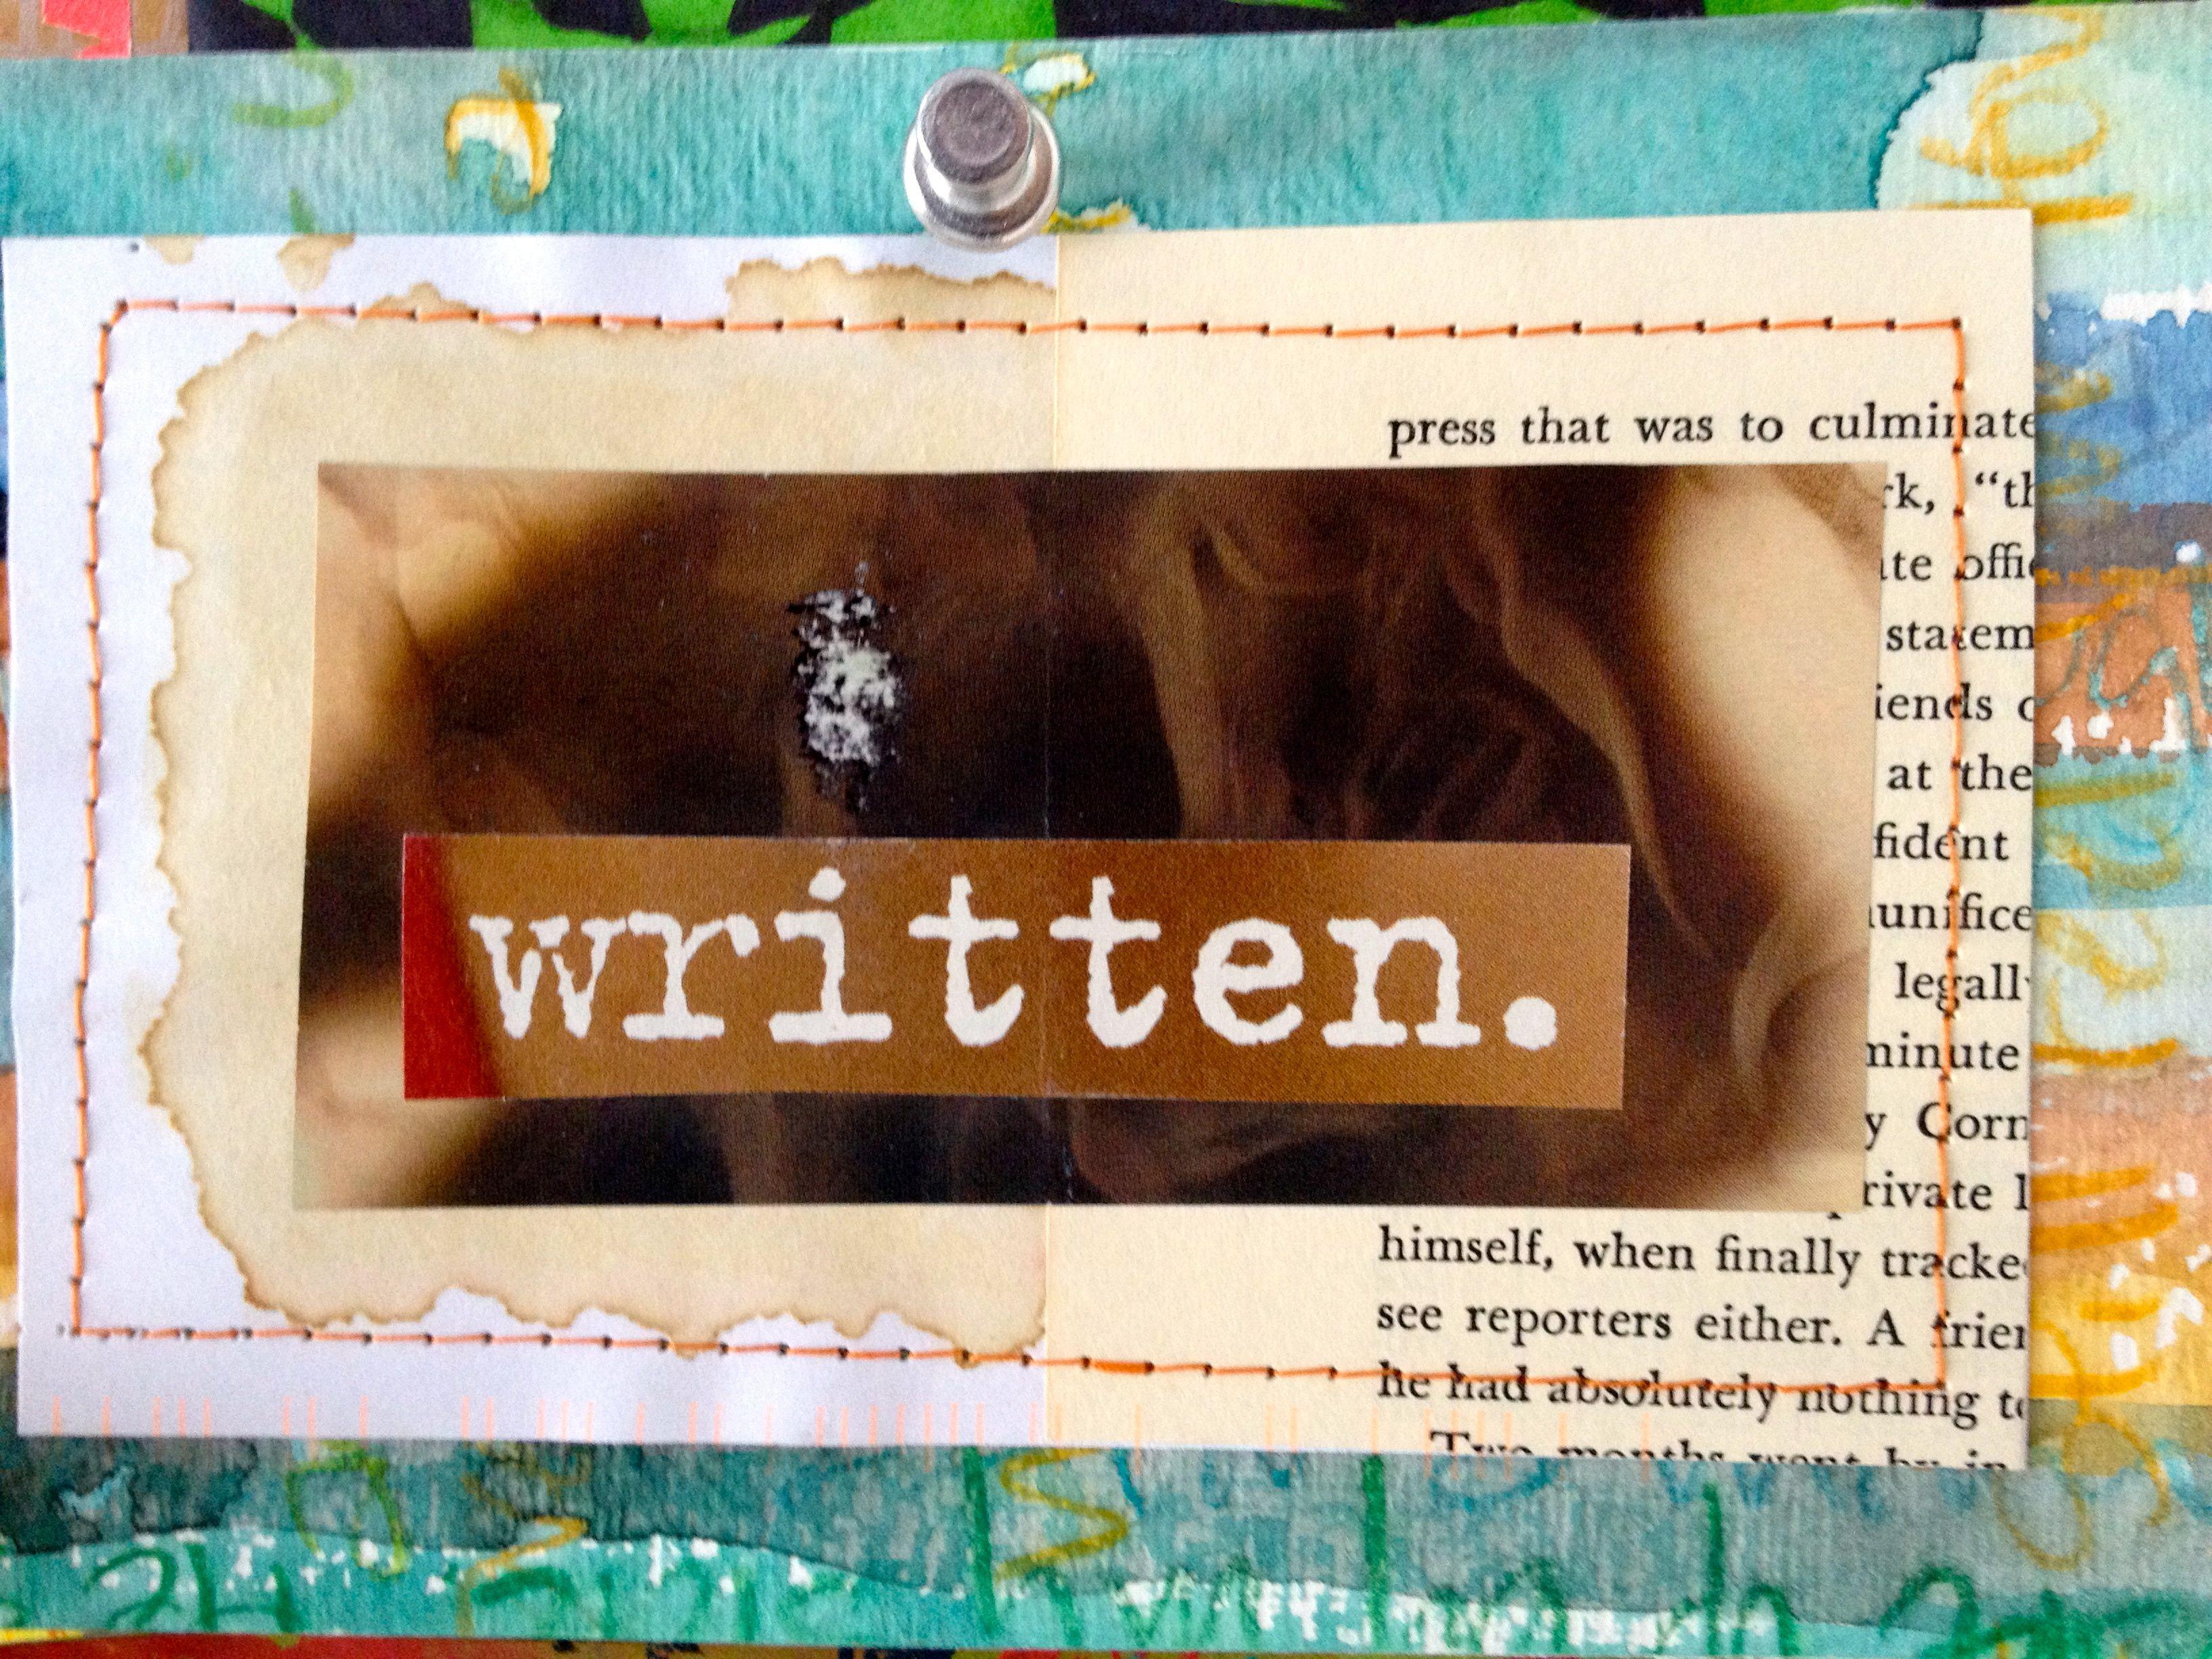 Carlene Taylor Simmons http://www.carlenetaylorsimmons.com/